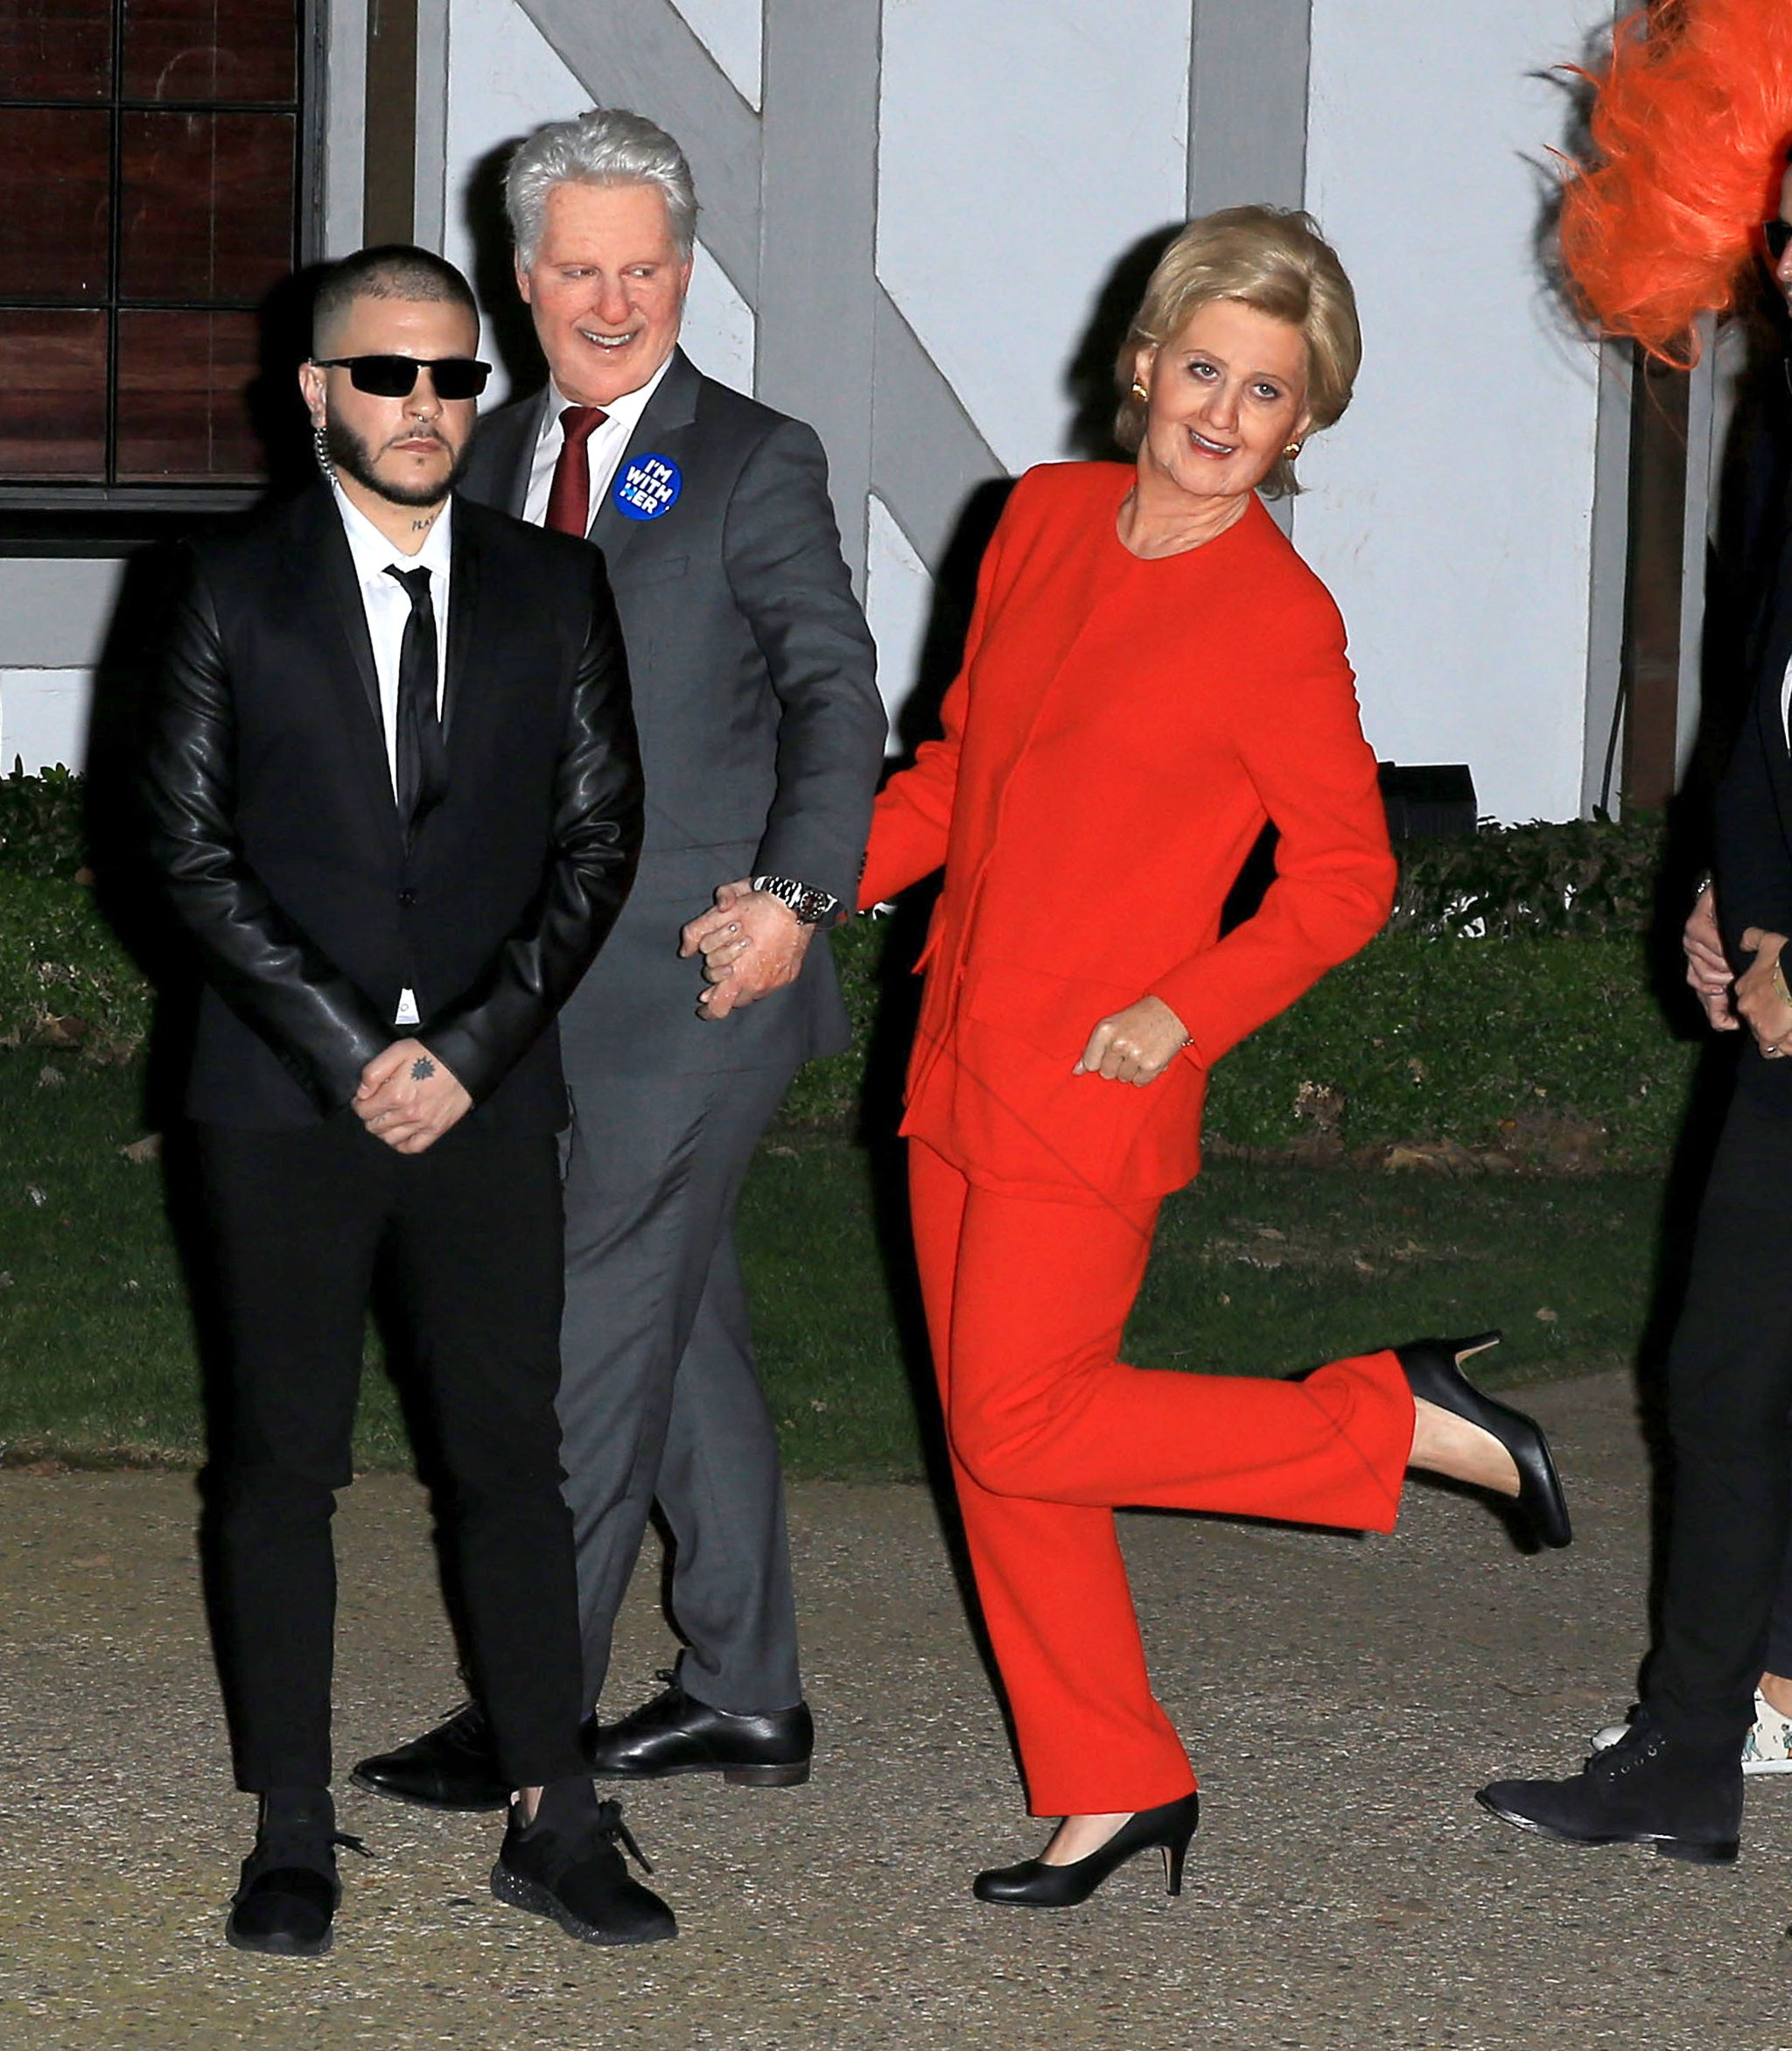 Halloween 2016: Katy Perry e il suo manager sono i Clinton